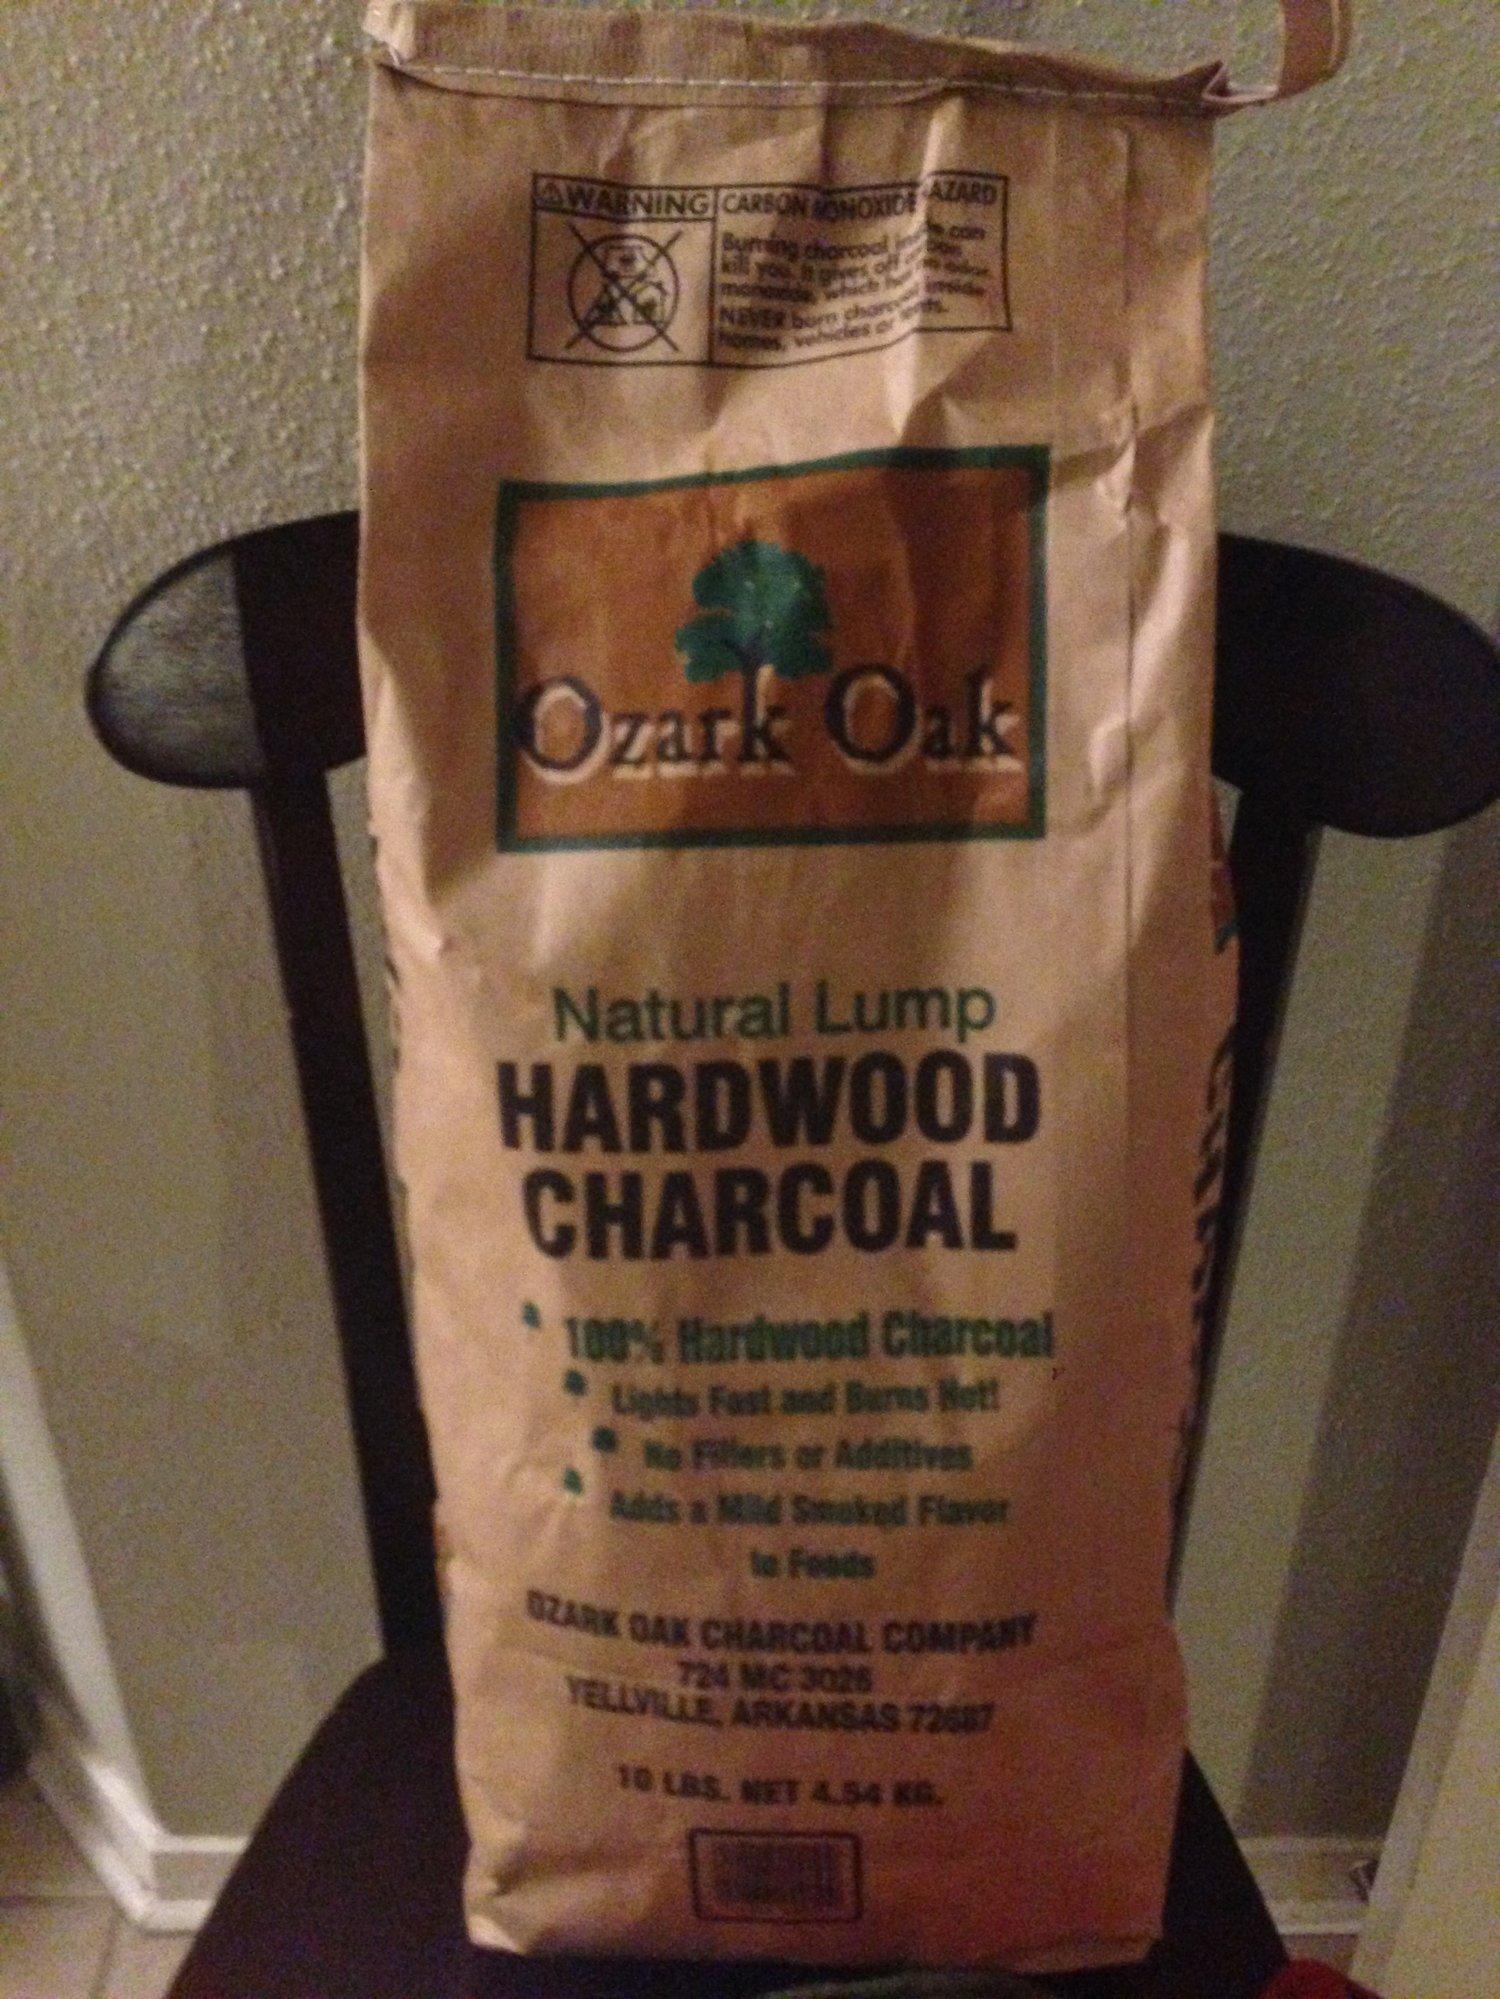 Ozark Oak Big Green Egg Egghead Forum The Ultimate Cooking Experience